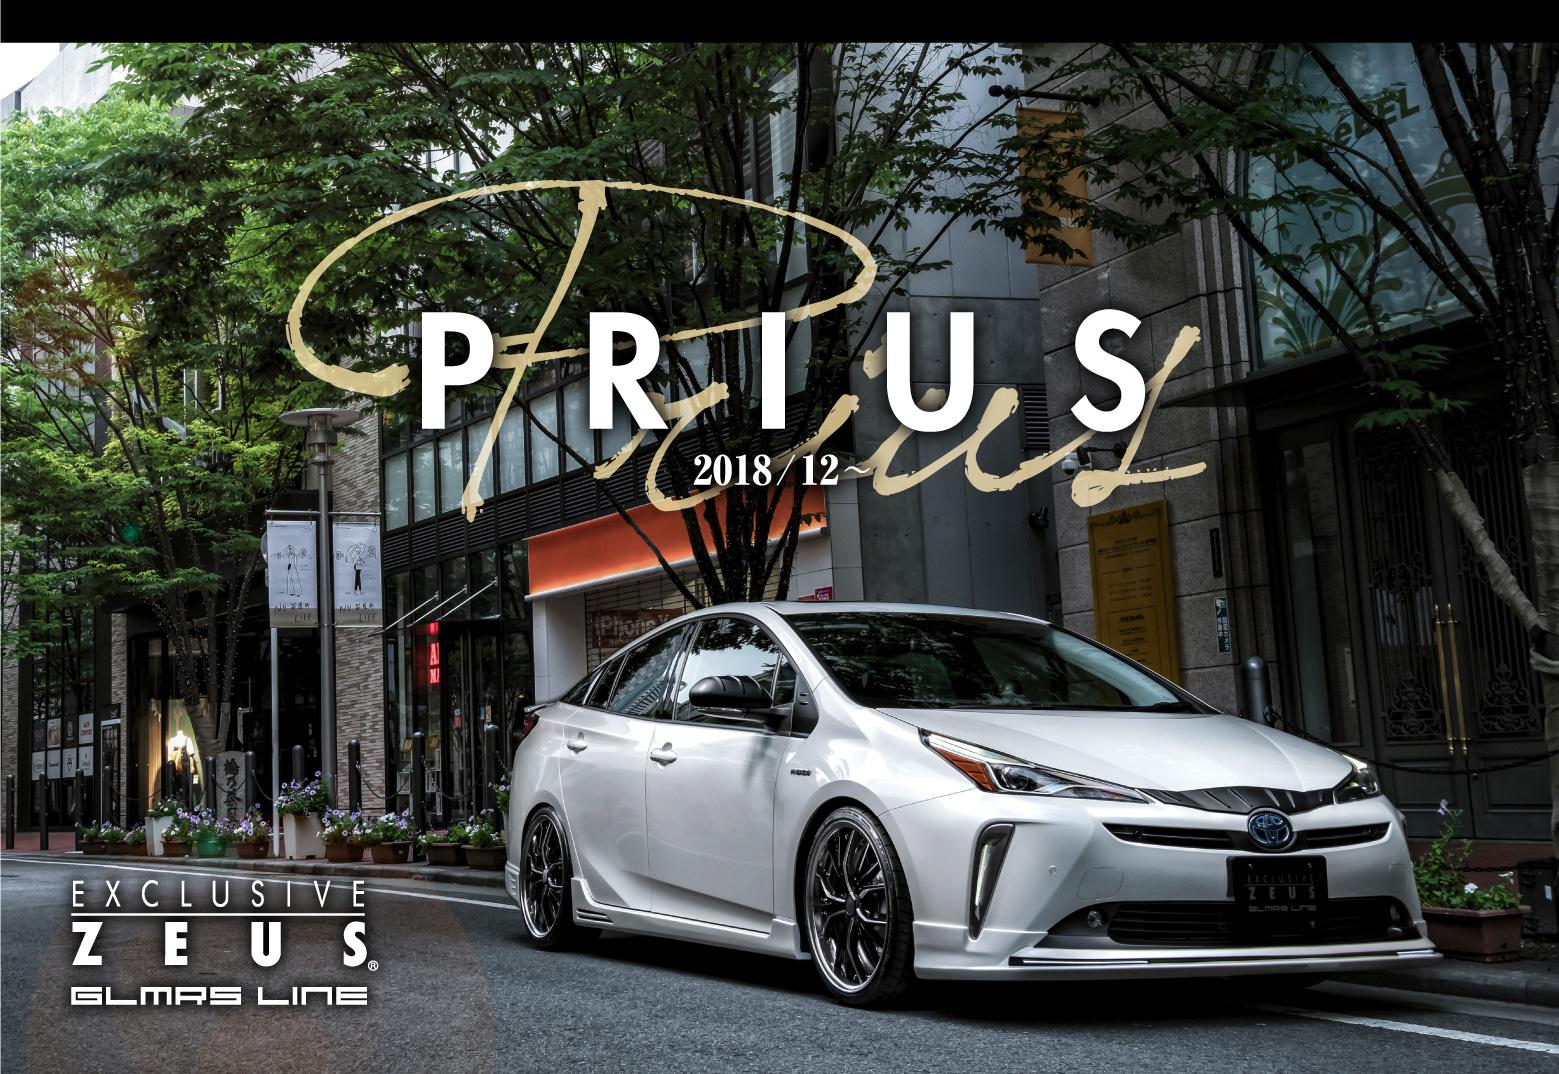 PRIUS 2018/12~ GLMRS LINE